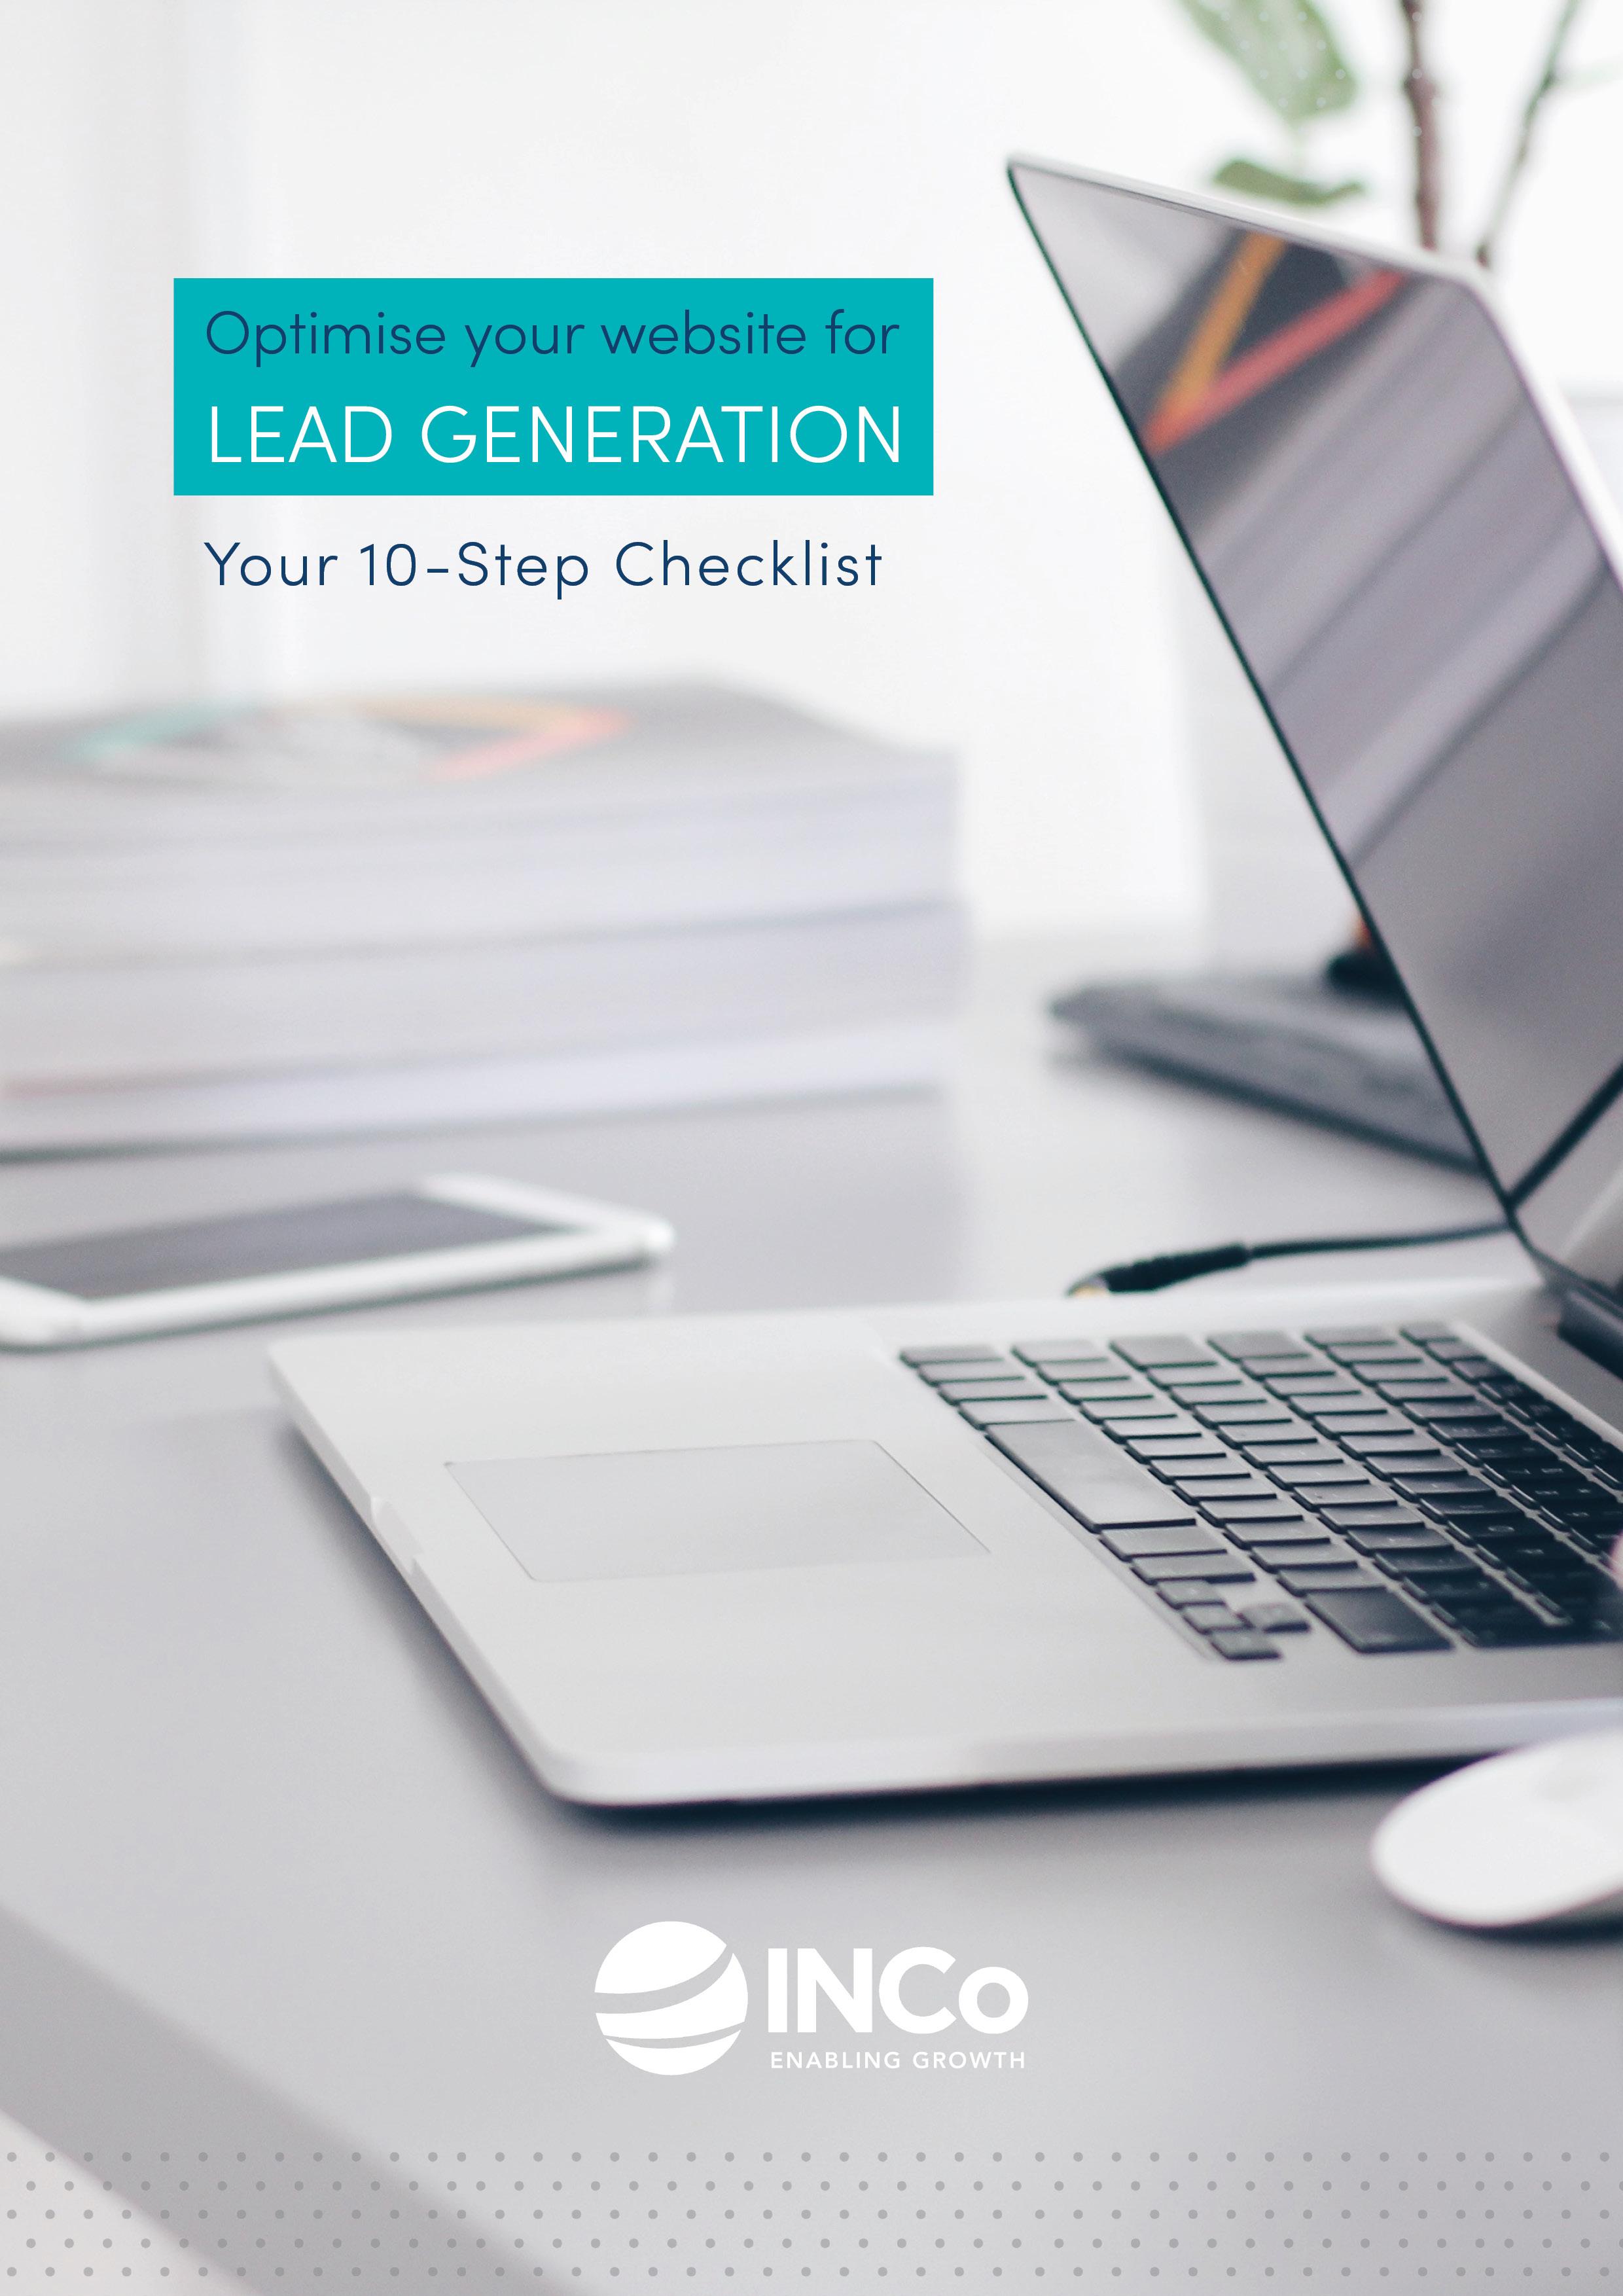 INCo-e-book-Optimise Your Website for Lead Gen-Portrait